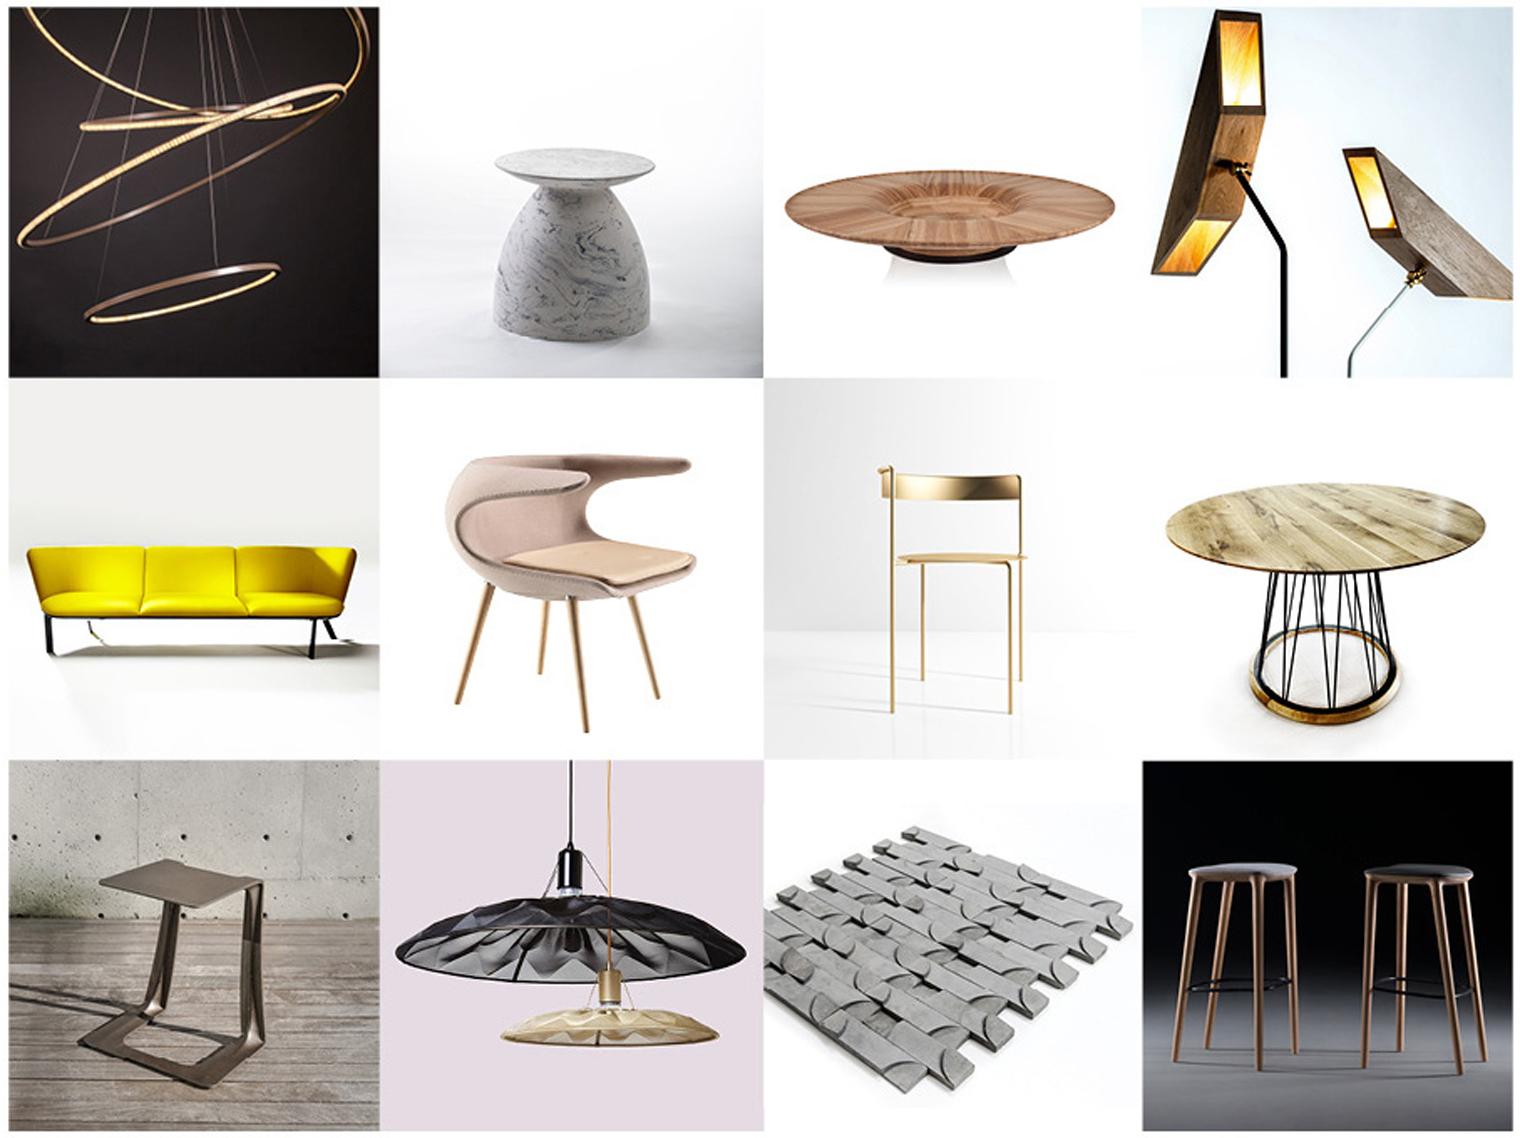 Los mejores muebles para hosteler a for Milano design award 2016